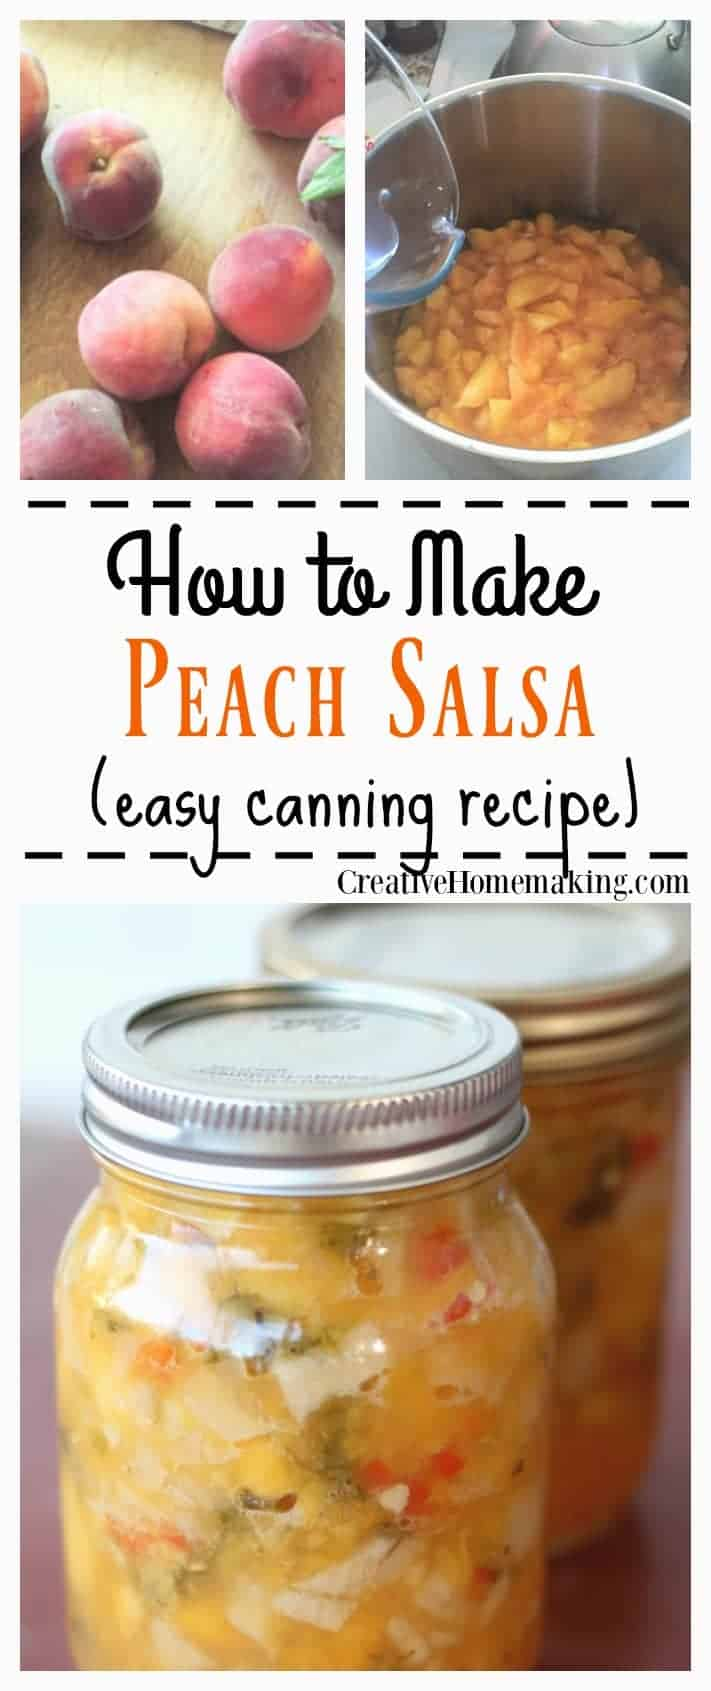 peach salsa creative home making - 7 Healthy Treats for Satisfying Sugar Cravings + An Easy Homemade Popcorn Recipe